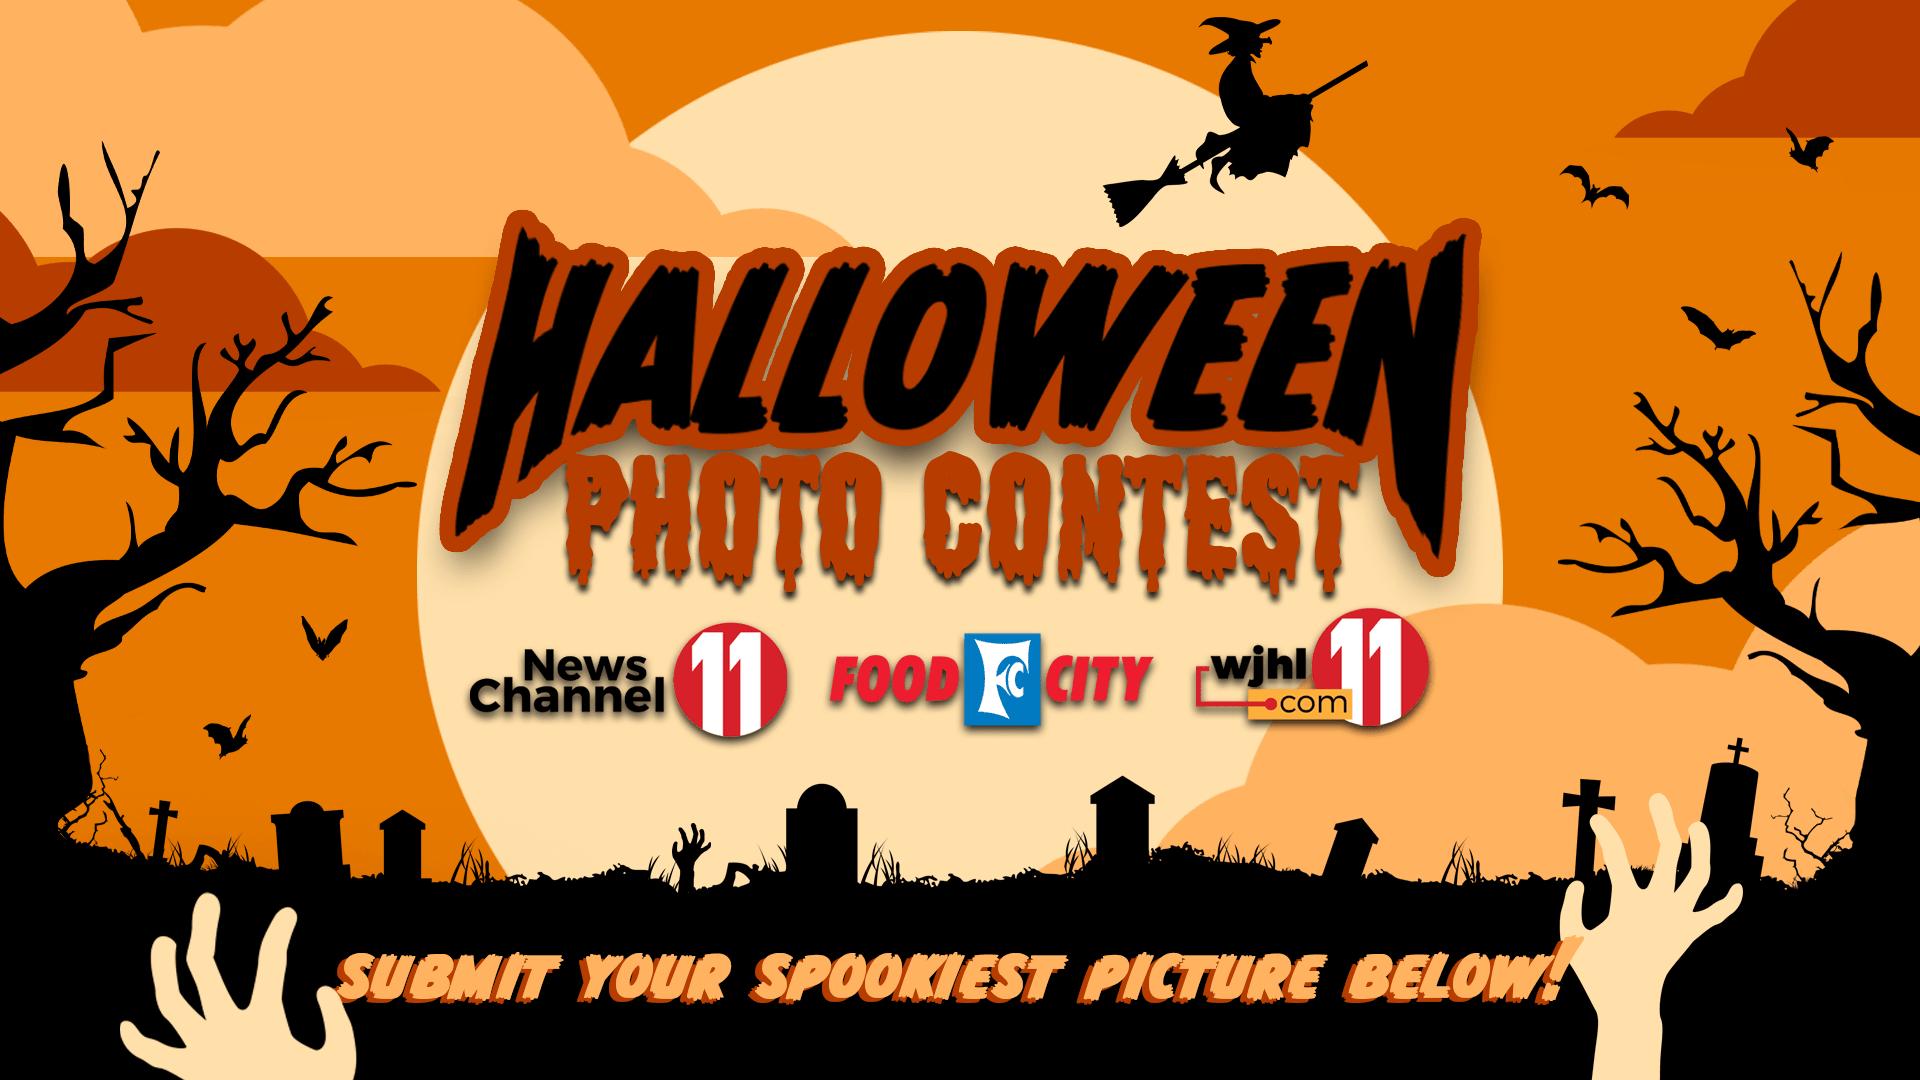 Wjhl Halloween 2020 Halloween Photo Contest | WJHL | Tri Cities News & Weather